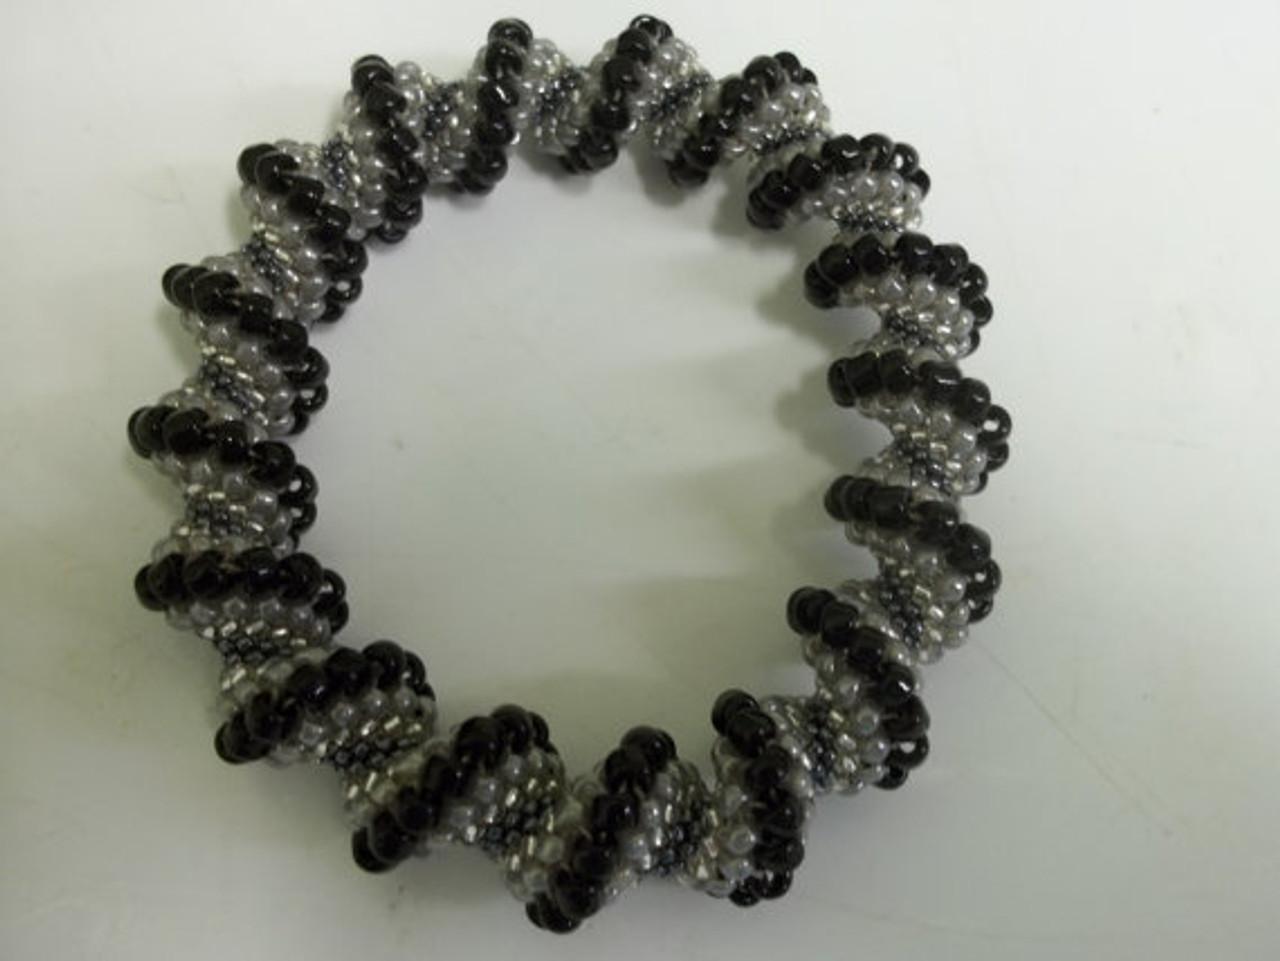 Spiral Peyote Stitch Bangle Bracelet Tutorial - INSTANT DOWNLOAD